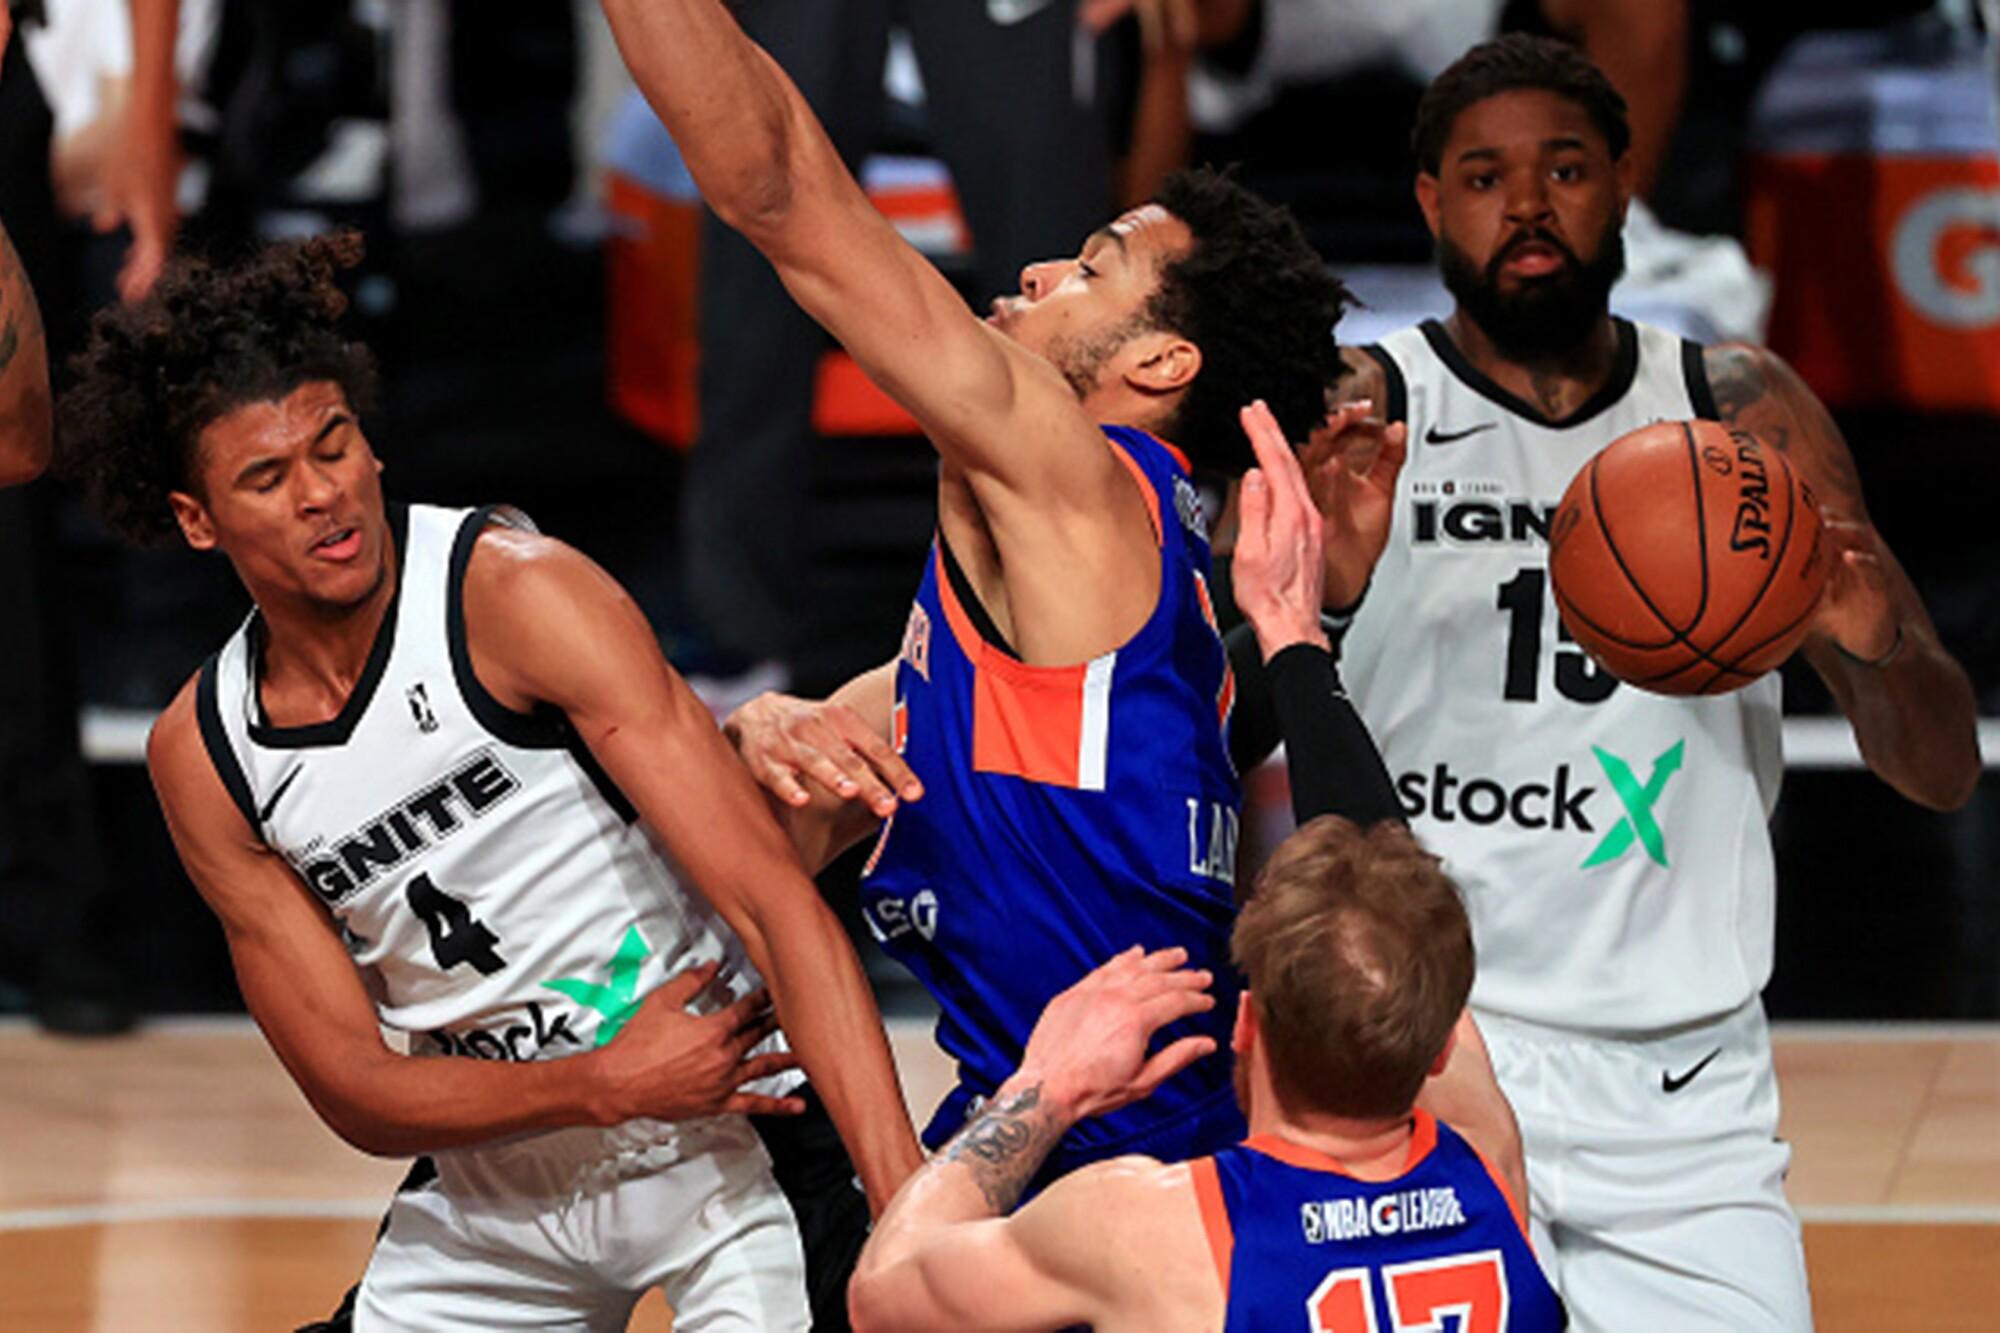 Ignite's Jalen Green (4) flips a pass between Westchester Knicks defenders during a G league game last season.